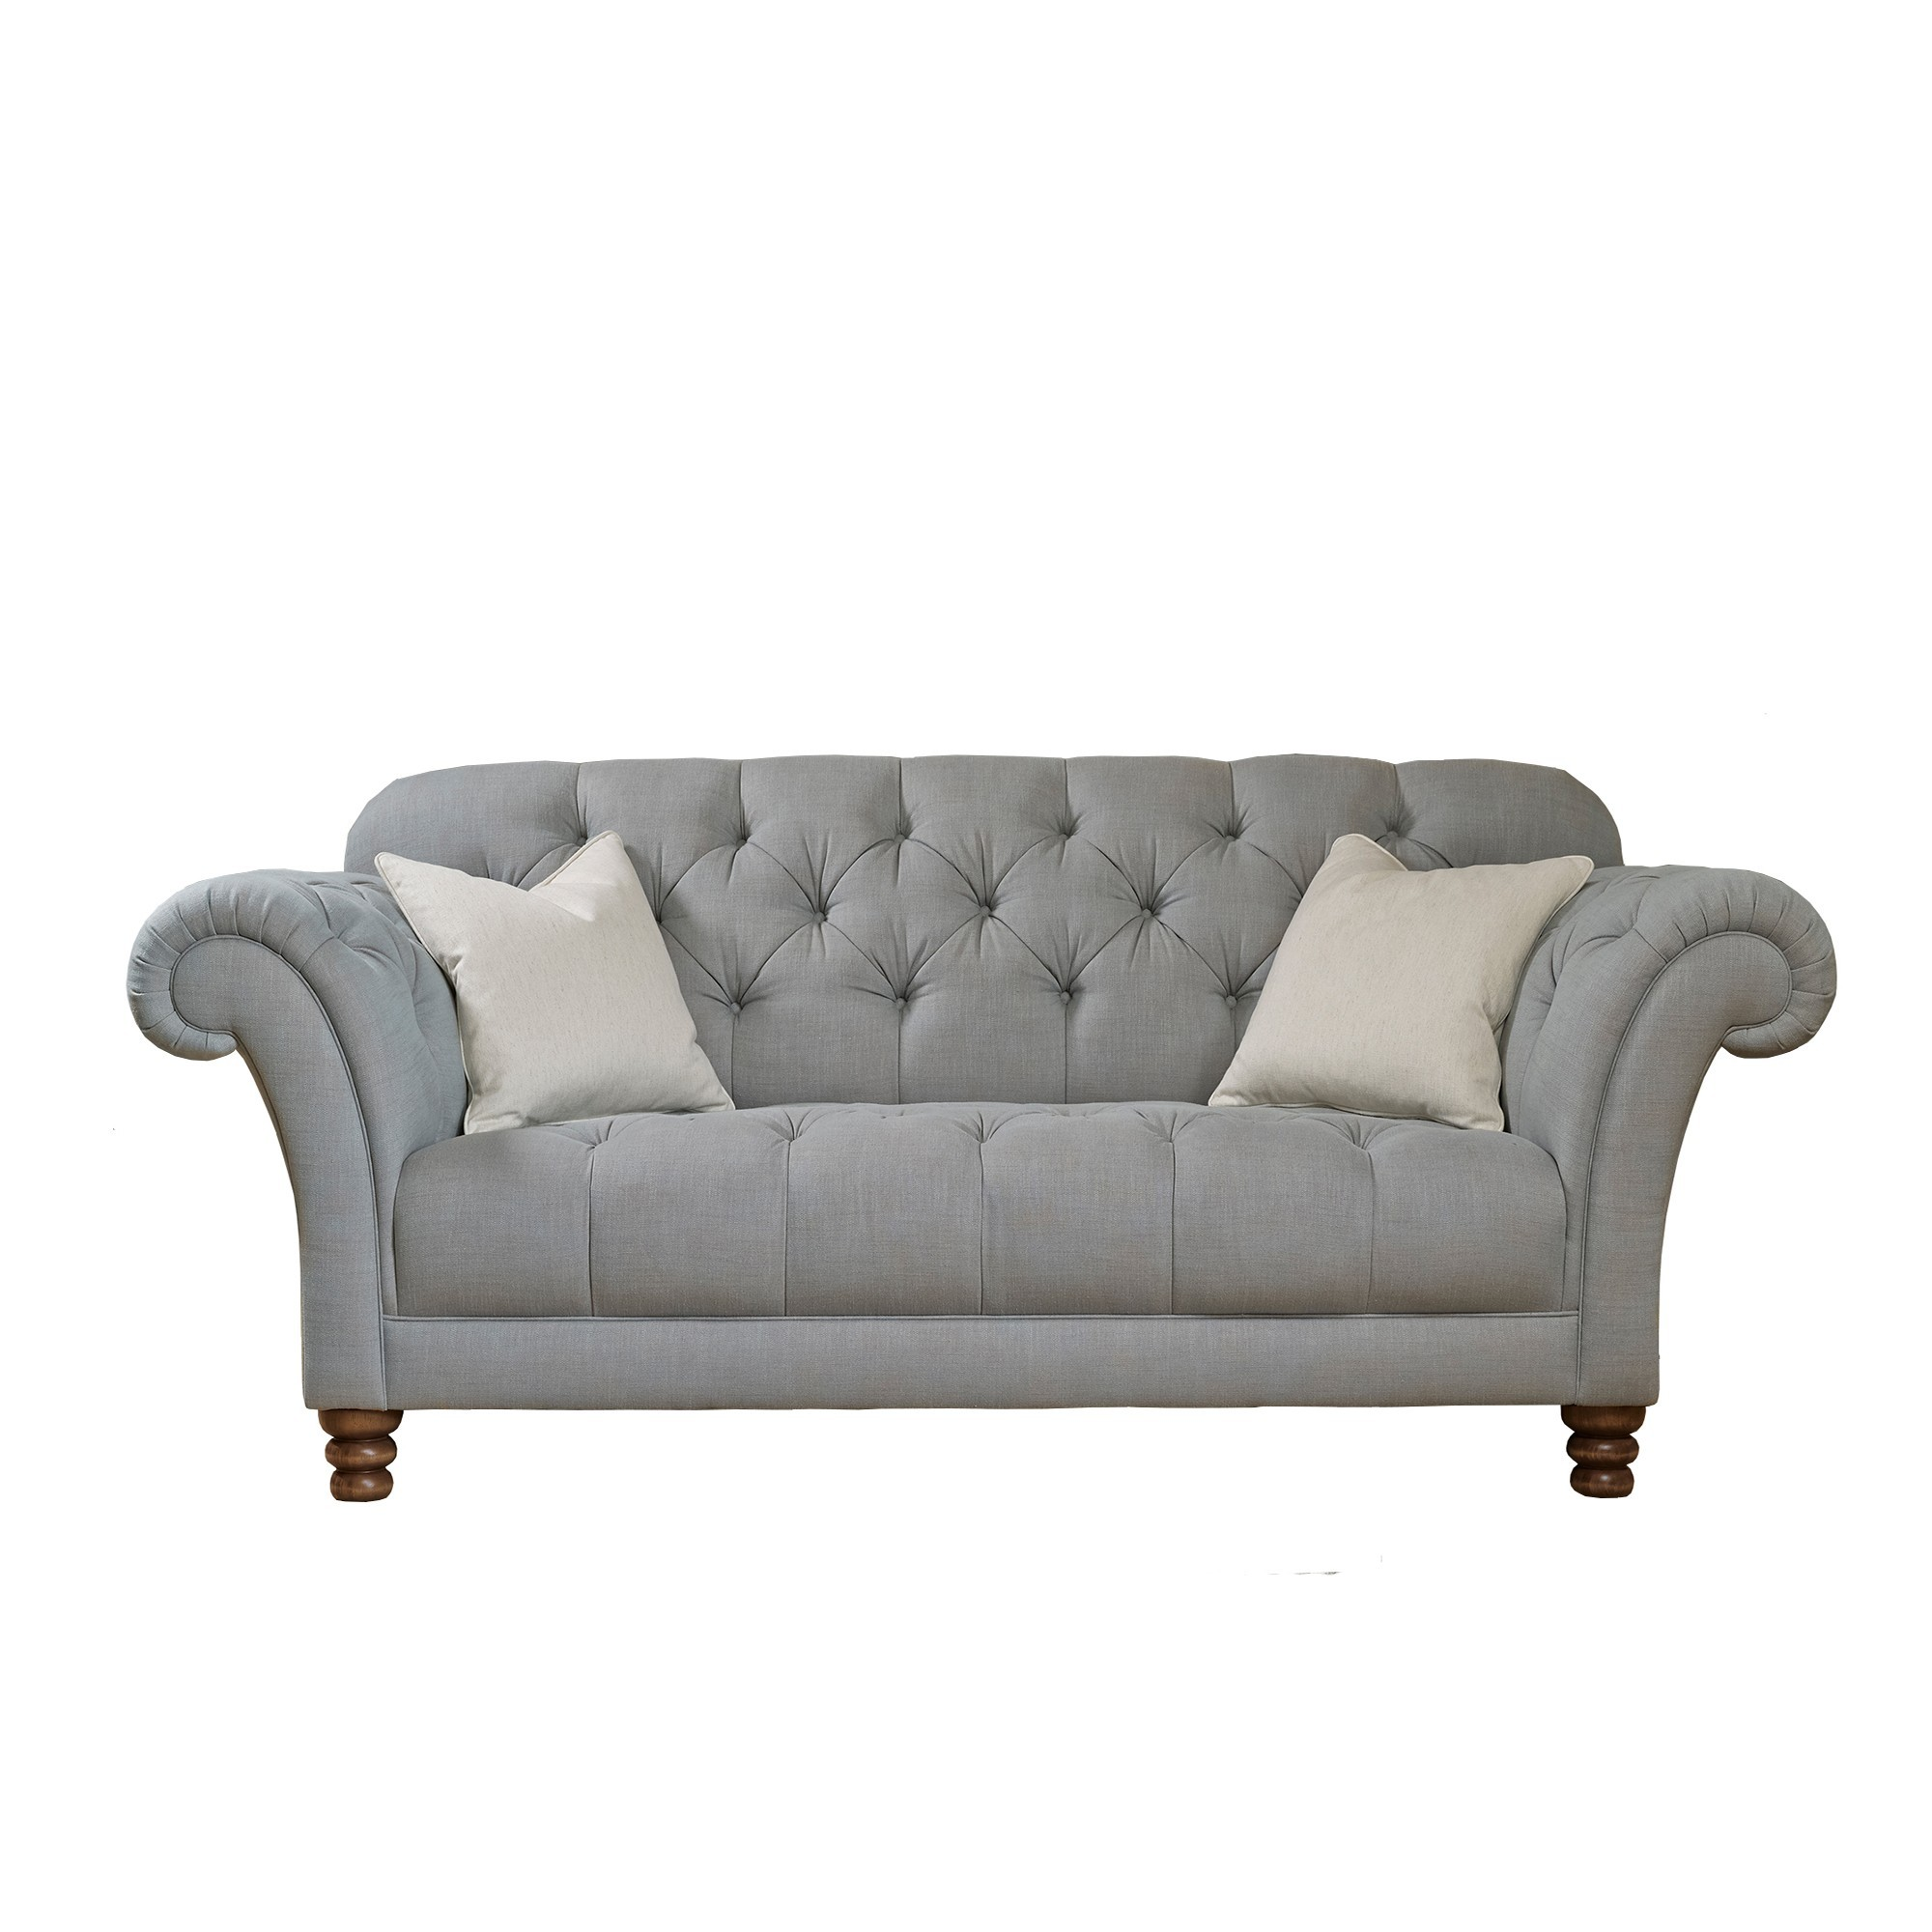 Wade Upholstery Henry Small Sofa